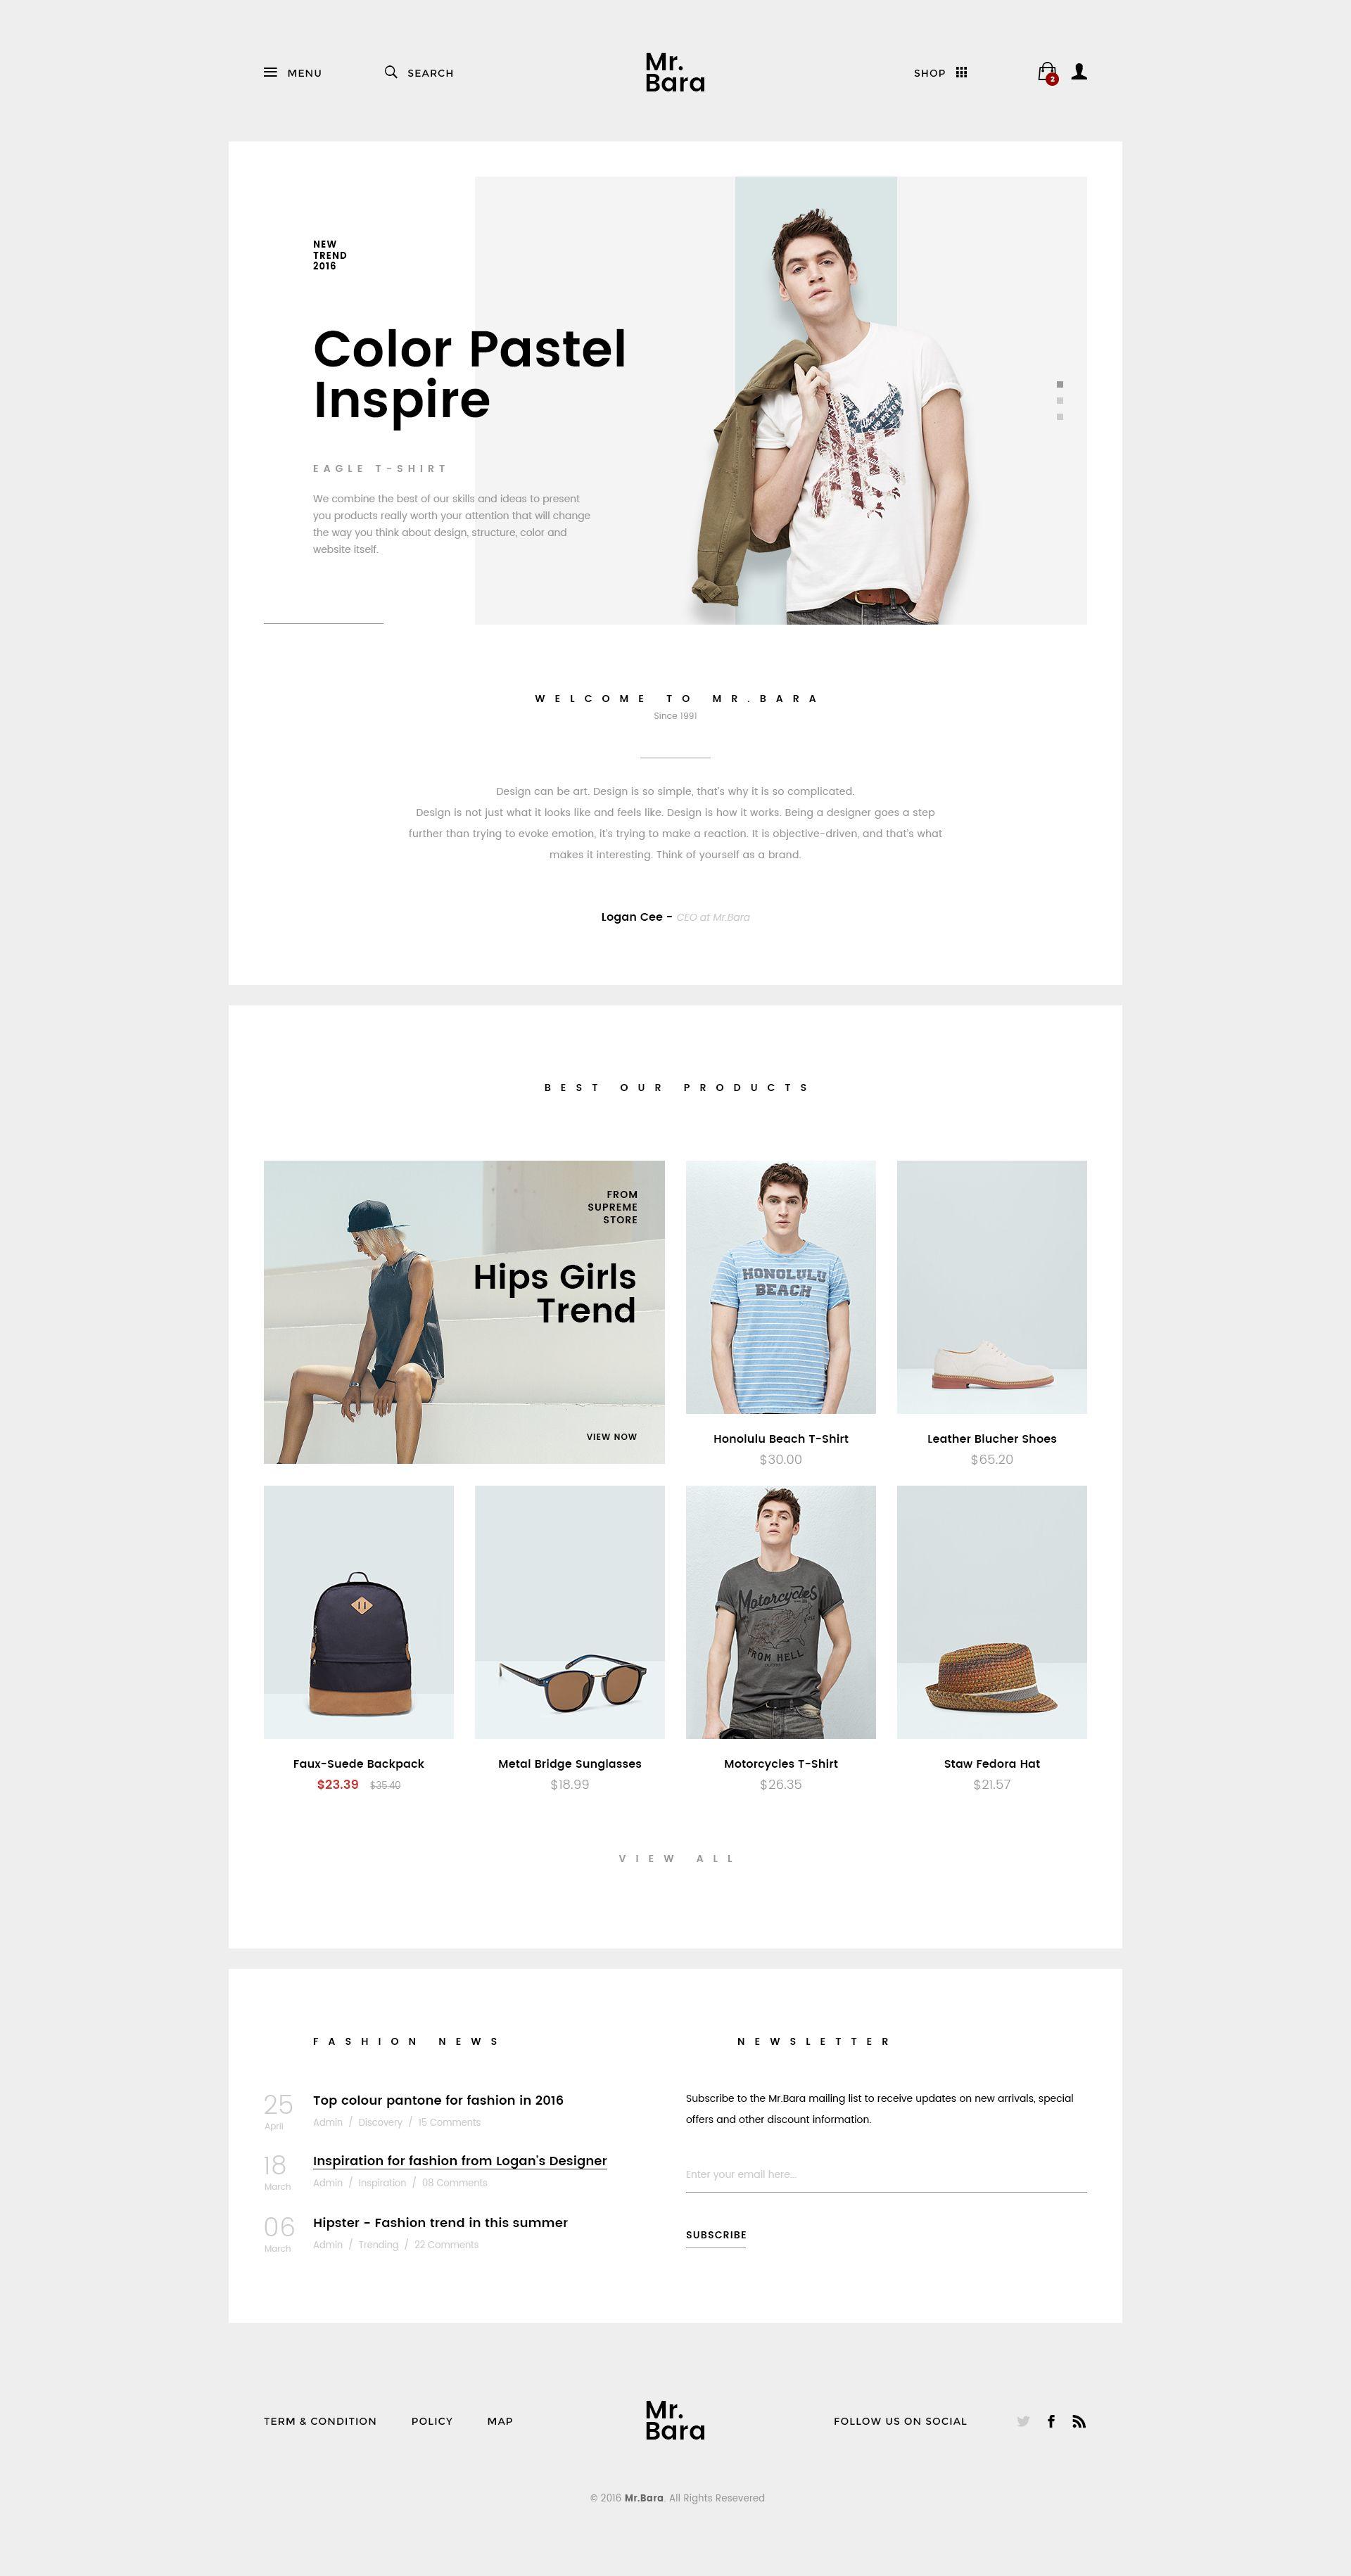 Home Boxed Jpg By C Knightz Art Ecommerce Web Design Fashion Web Design Beautiful Websites